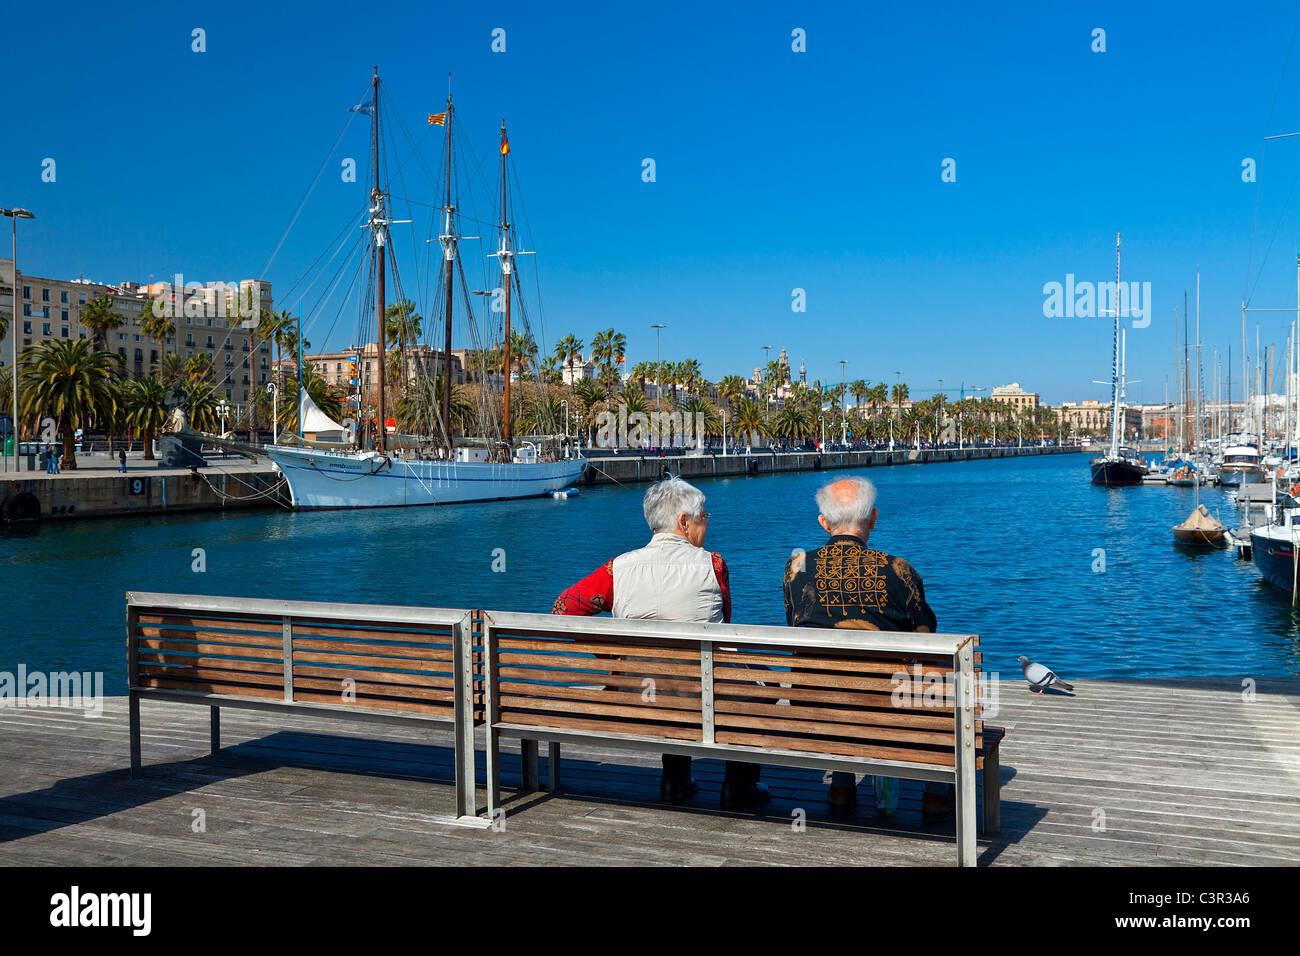 Barcelona, Rambla del Mar footbridge in Port Vell - Stock Image